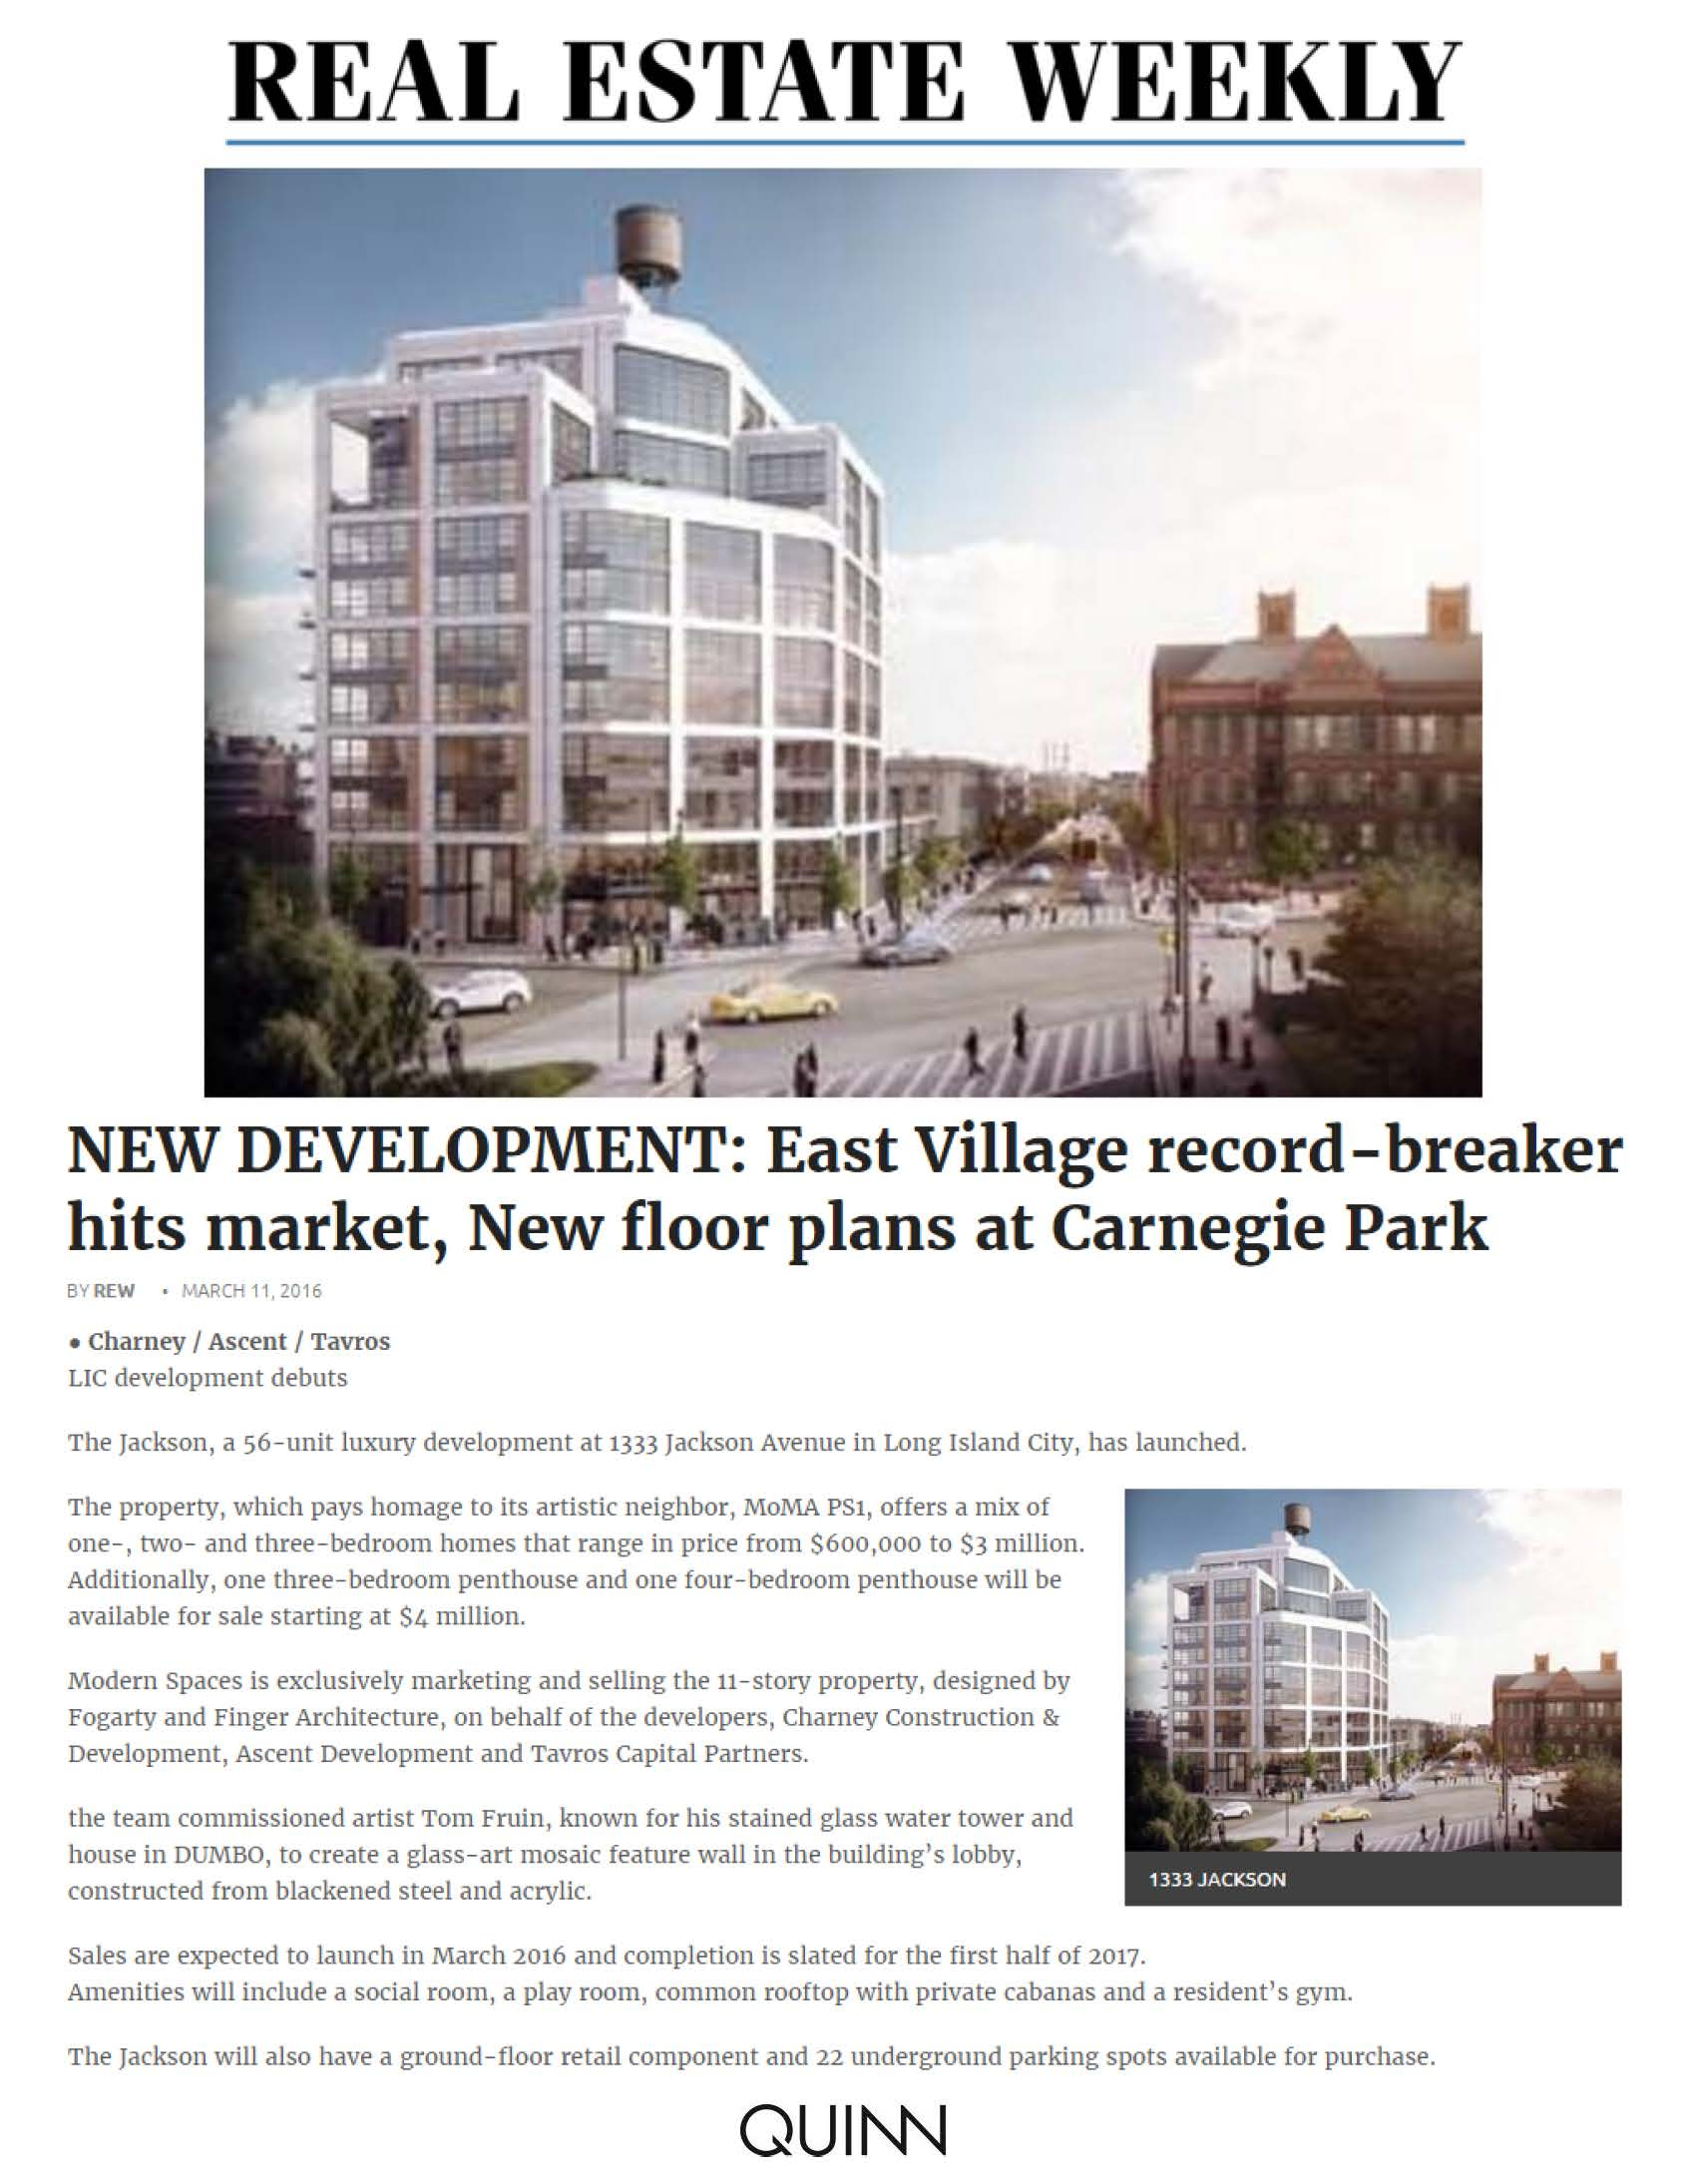 Real Estate Weekly - NEW DEVELOPMENT East Village record-breaker hits market, New floor plans at Carnegie Park - 03.11.16